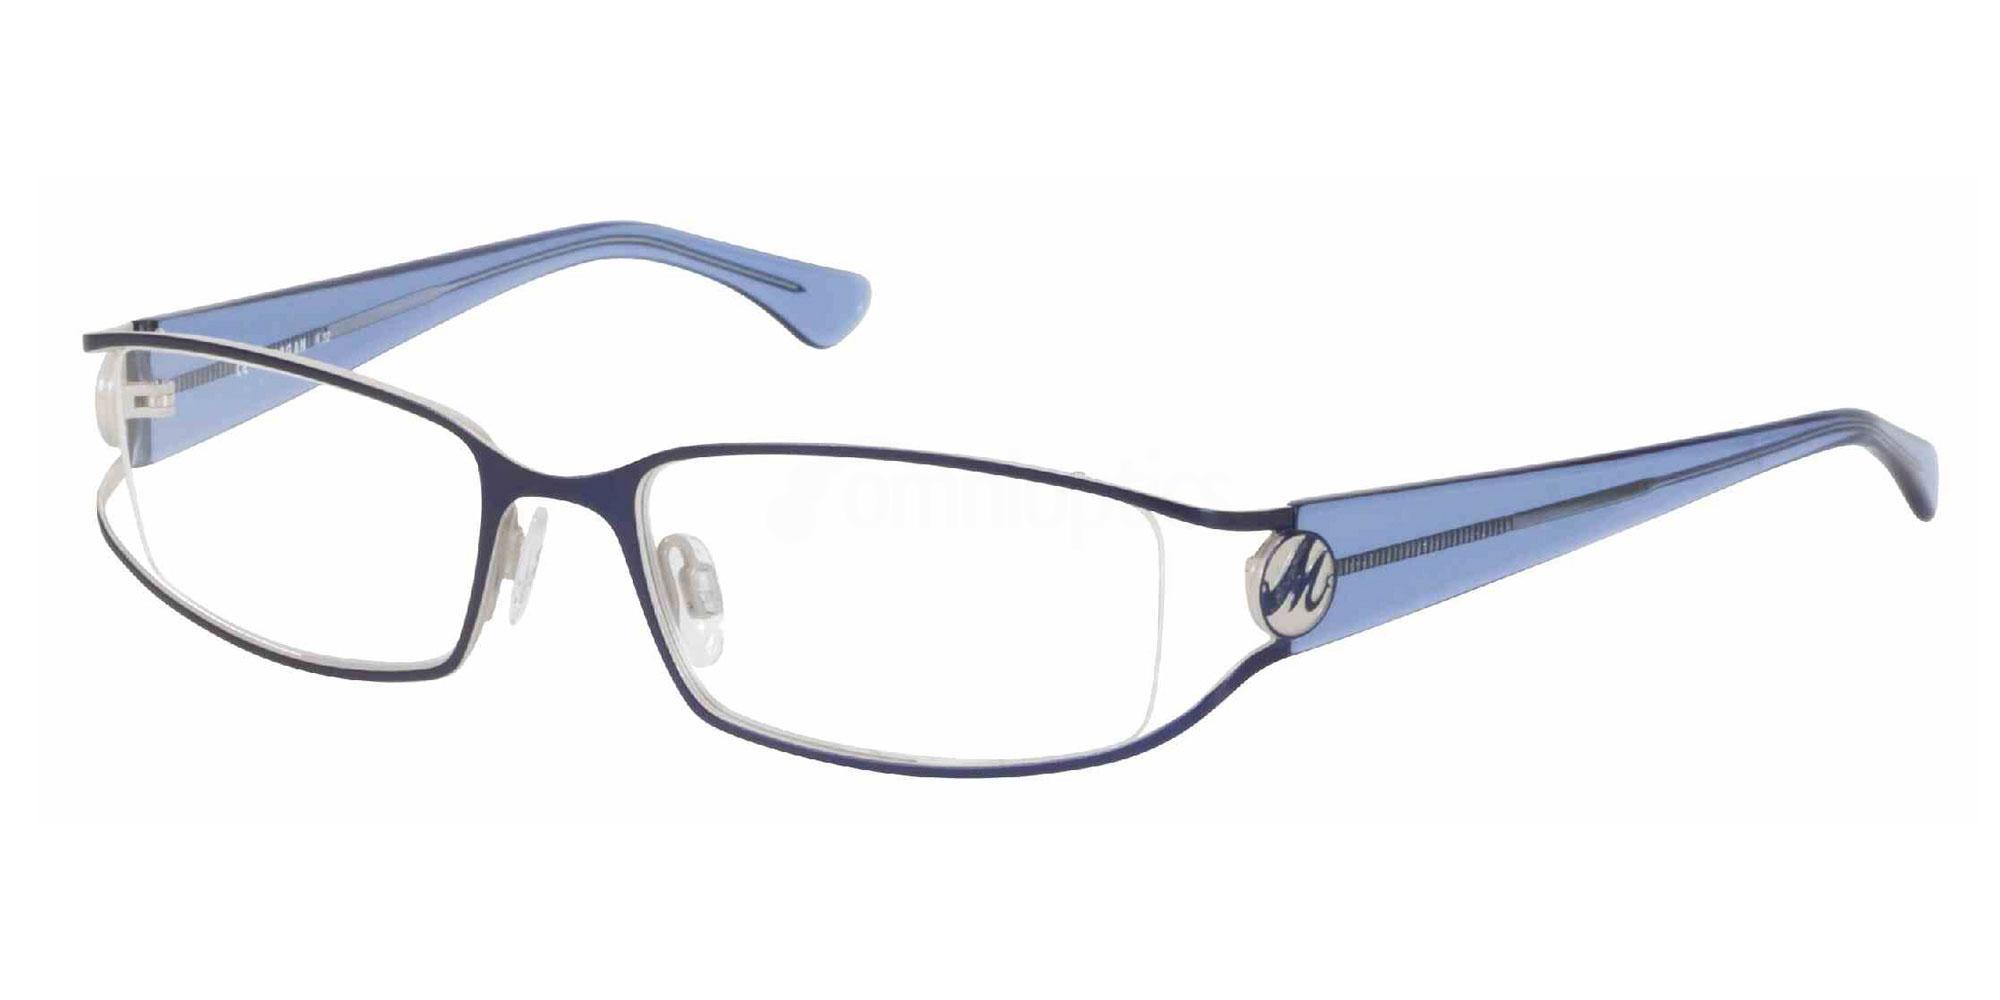 379 203106 , MORGAN Eyewear